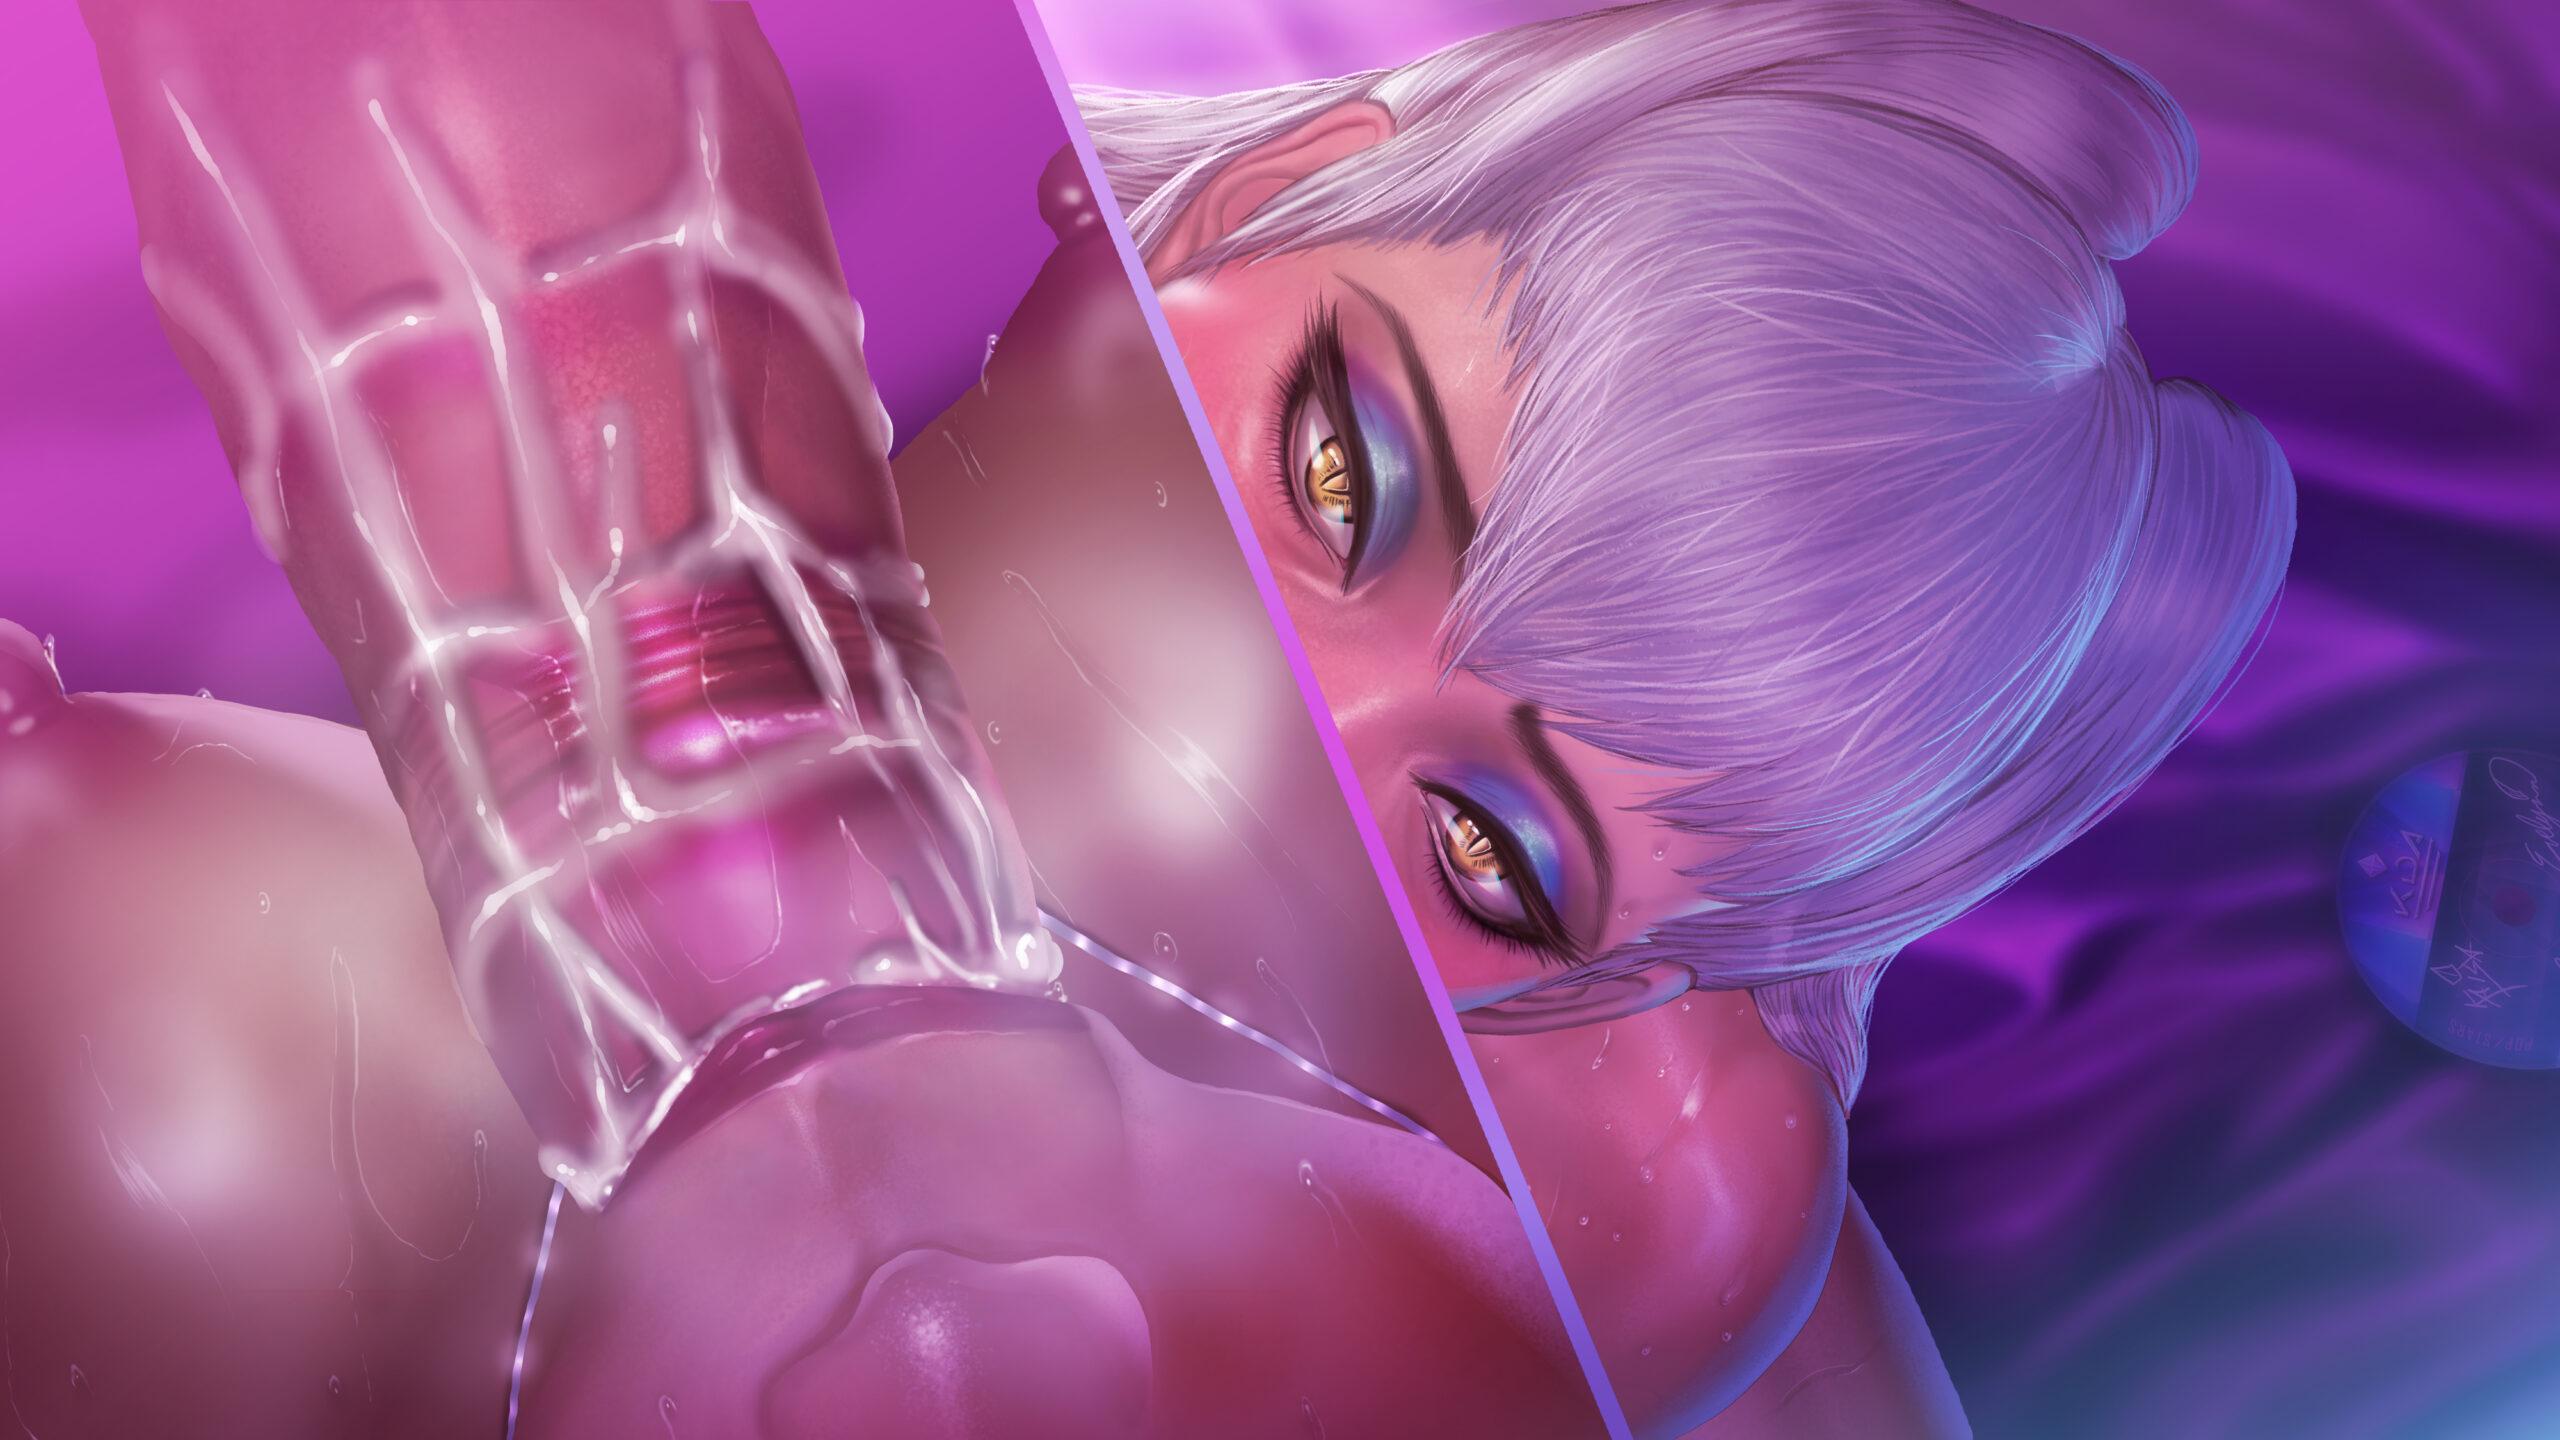 [NO TEXT ~ Artist CG] Roke ~ KDA Evelynn 1 : Blowjob Hentai